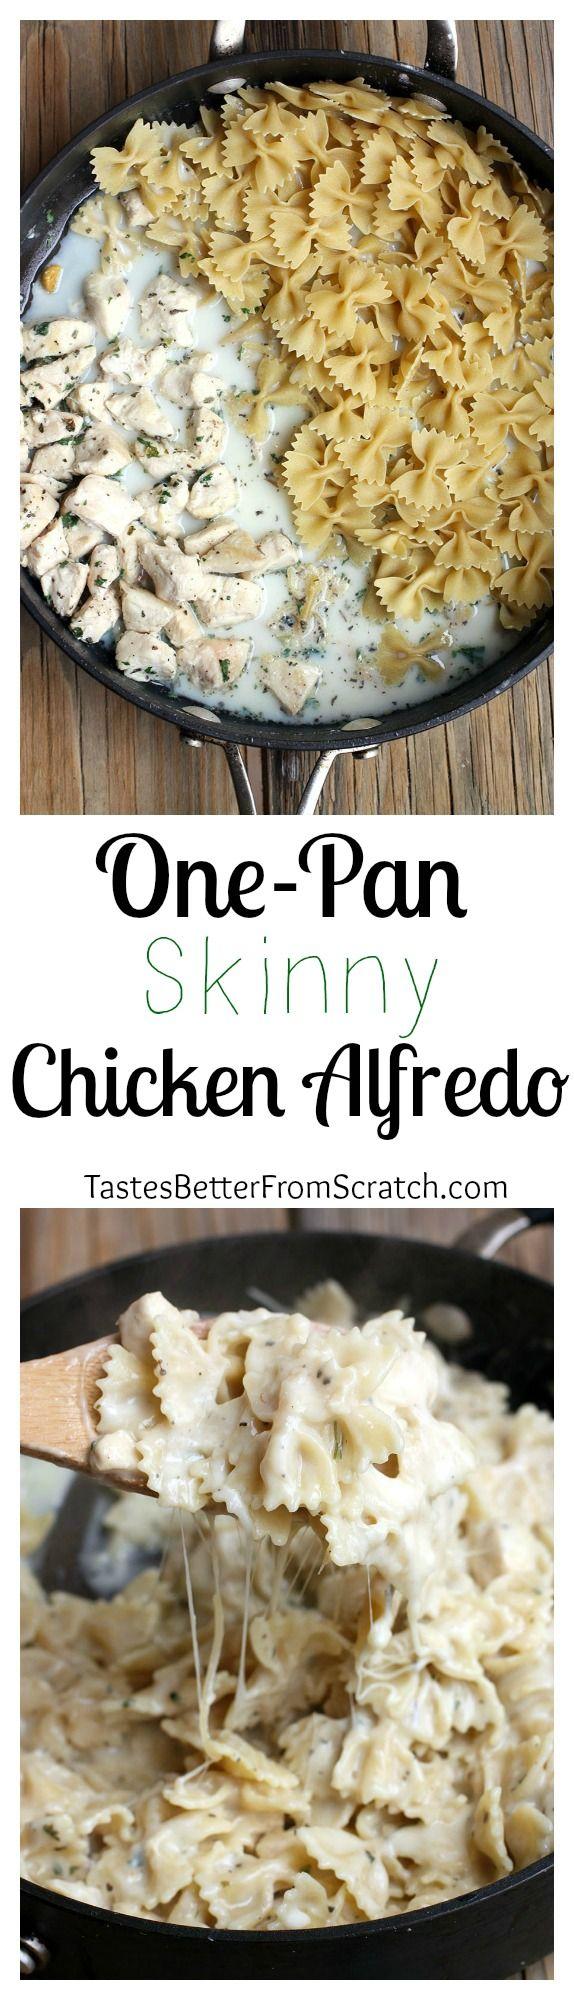 one-pan skinny chicken alfredo.